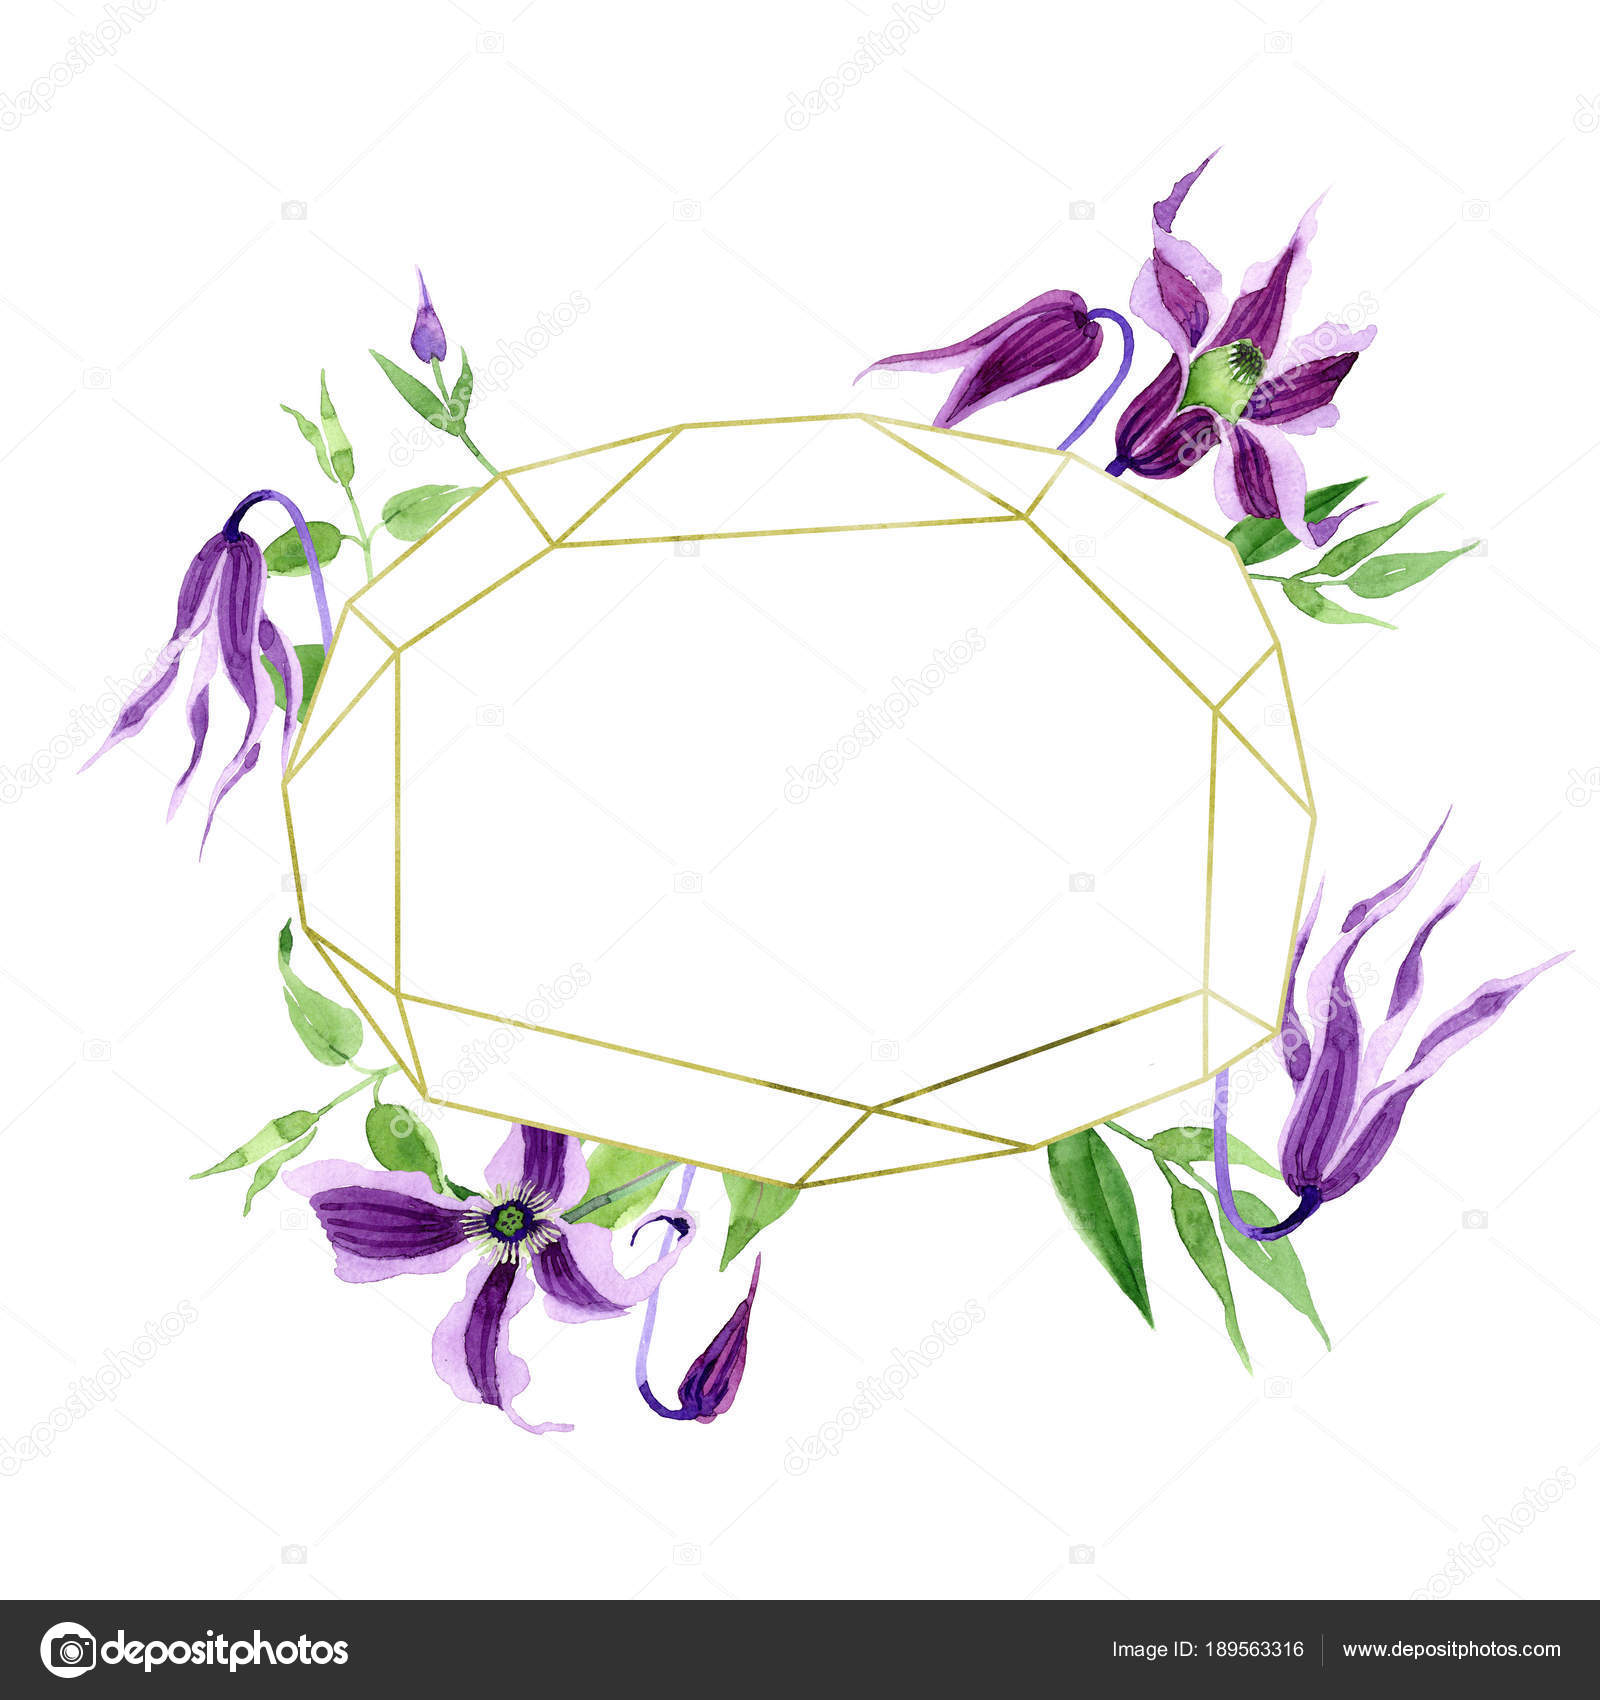 Wildflower Clematis Hanajima Blume Kranz im Aquarell-Stil ...